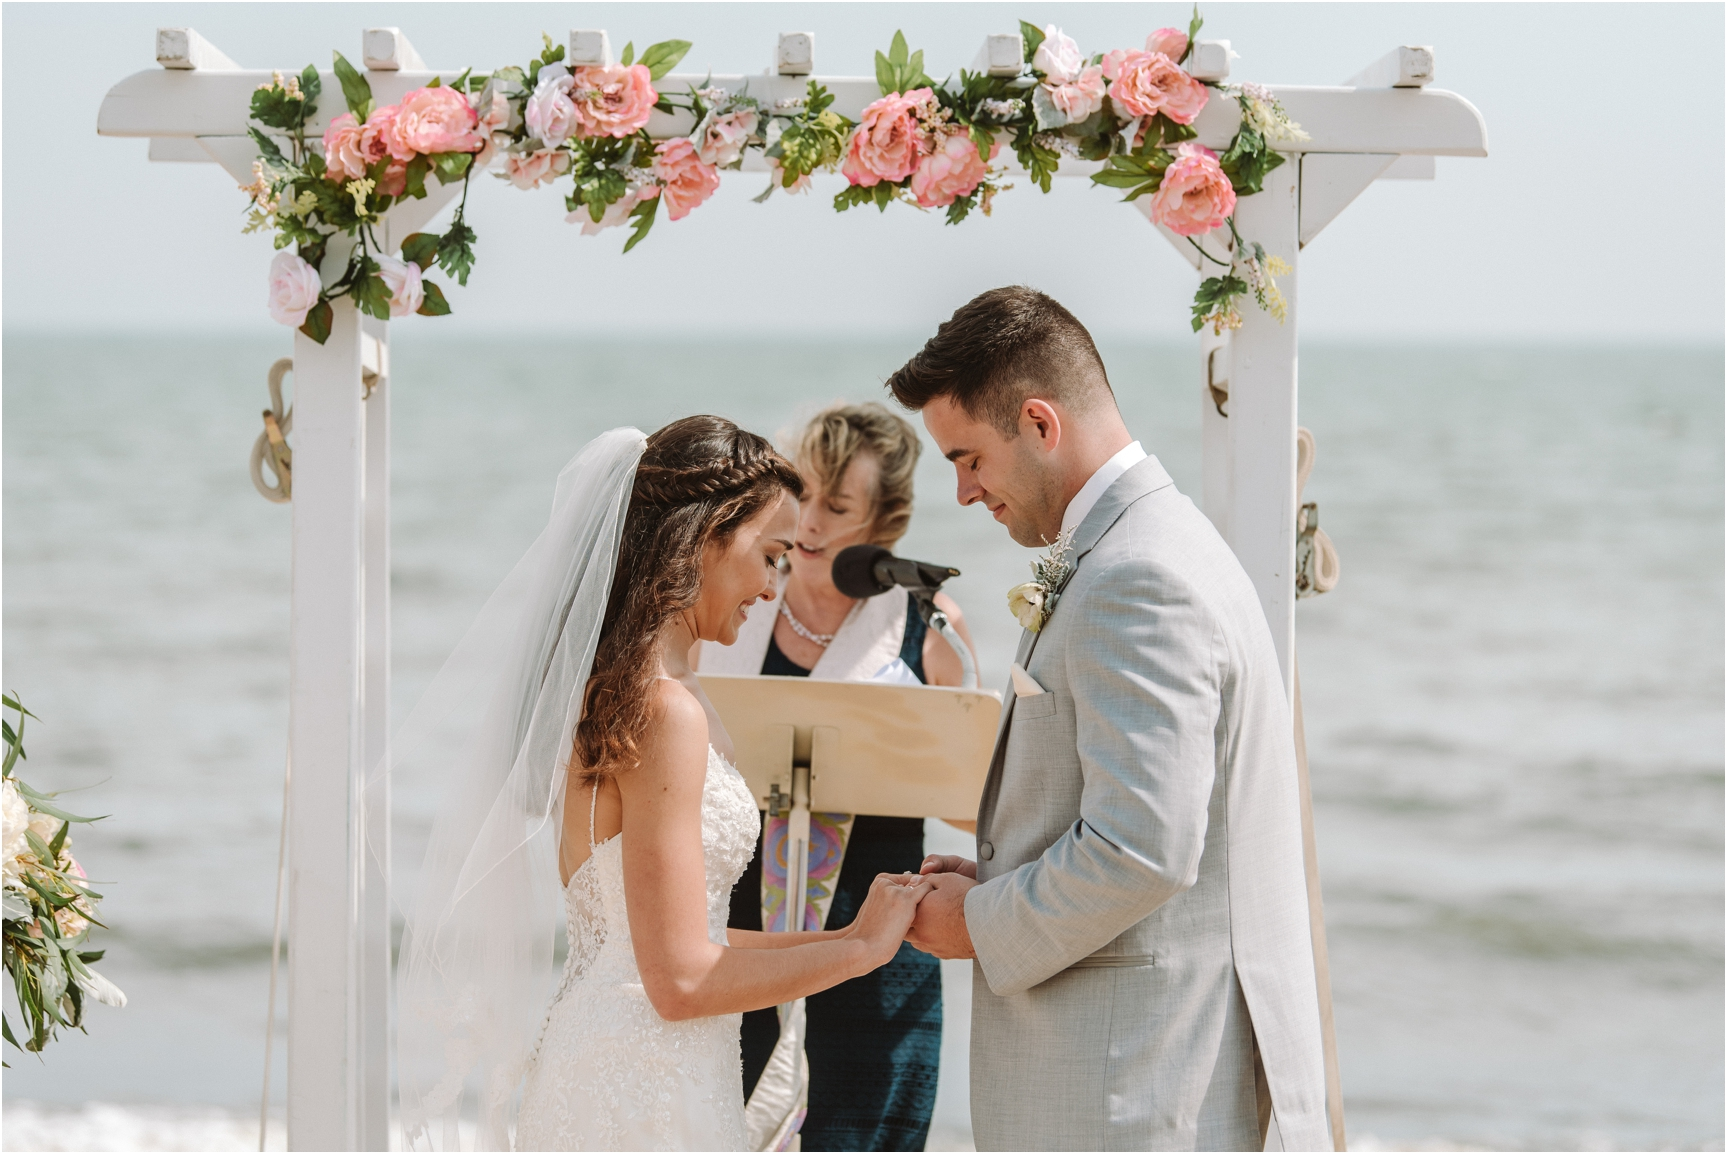 Sarah & Sam Pelham House Cape Cod Wedding Photographer-97.jpg